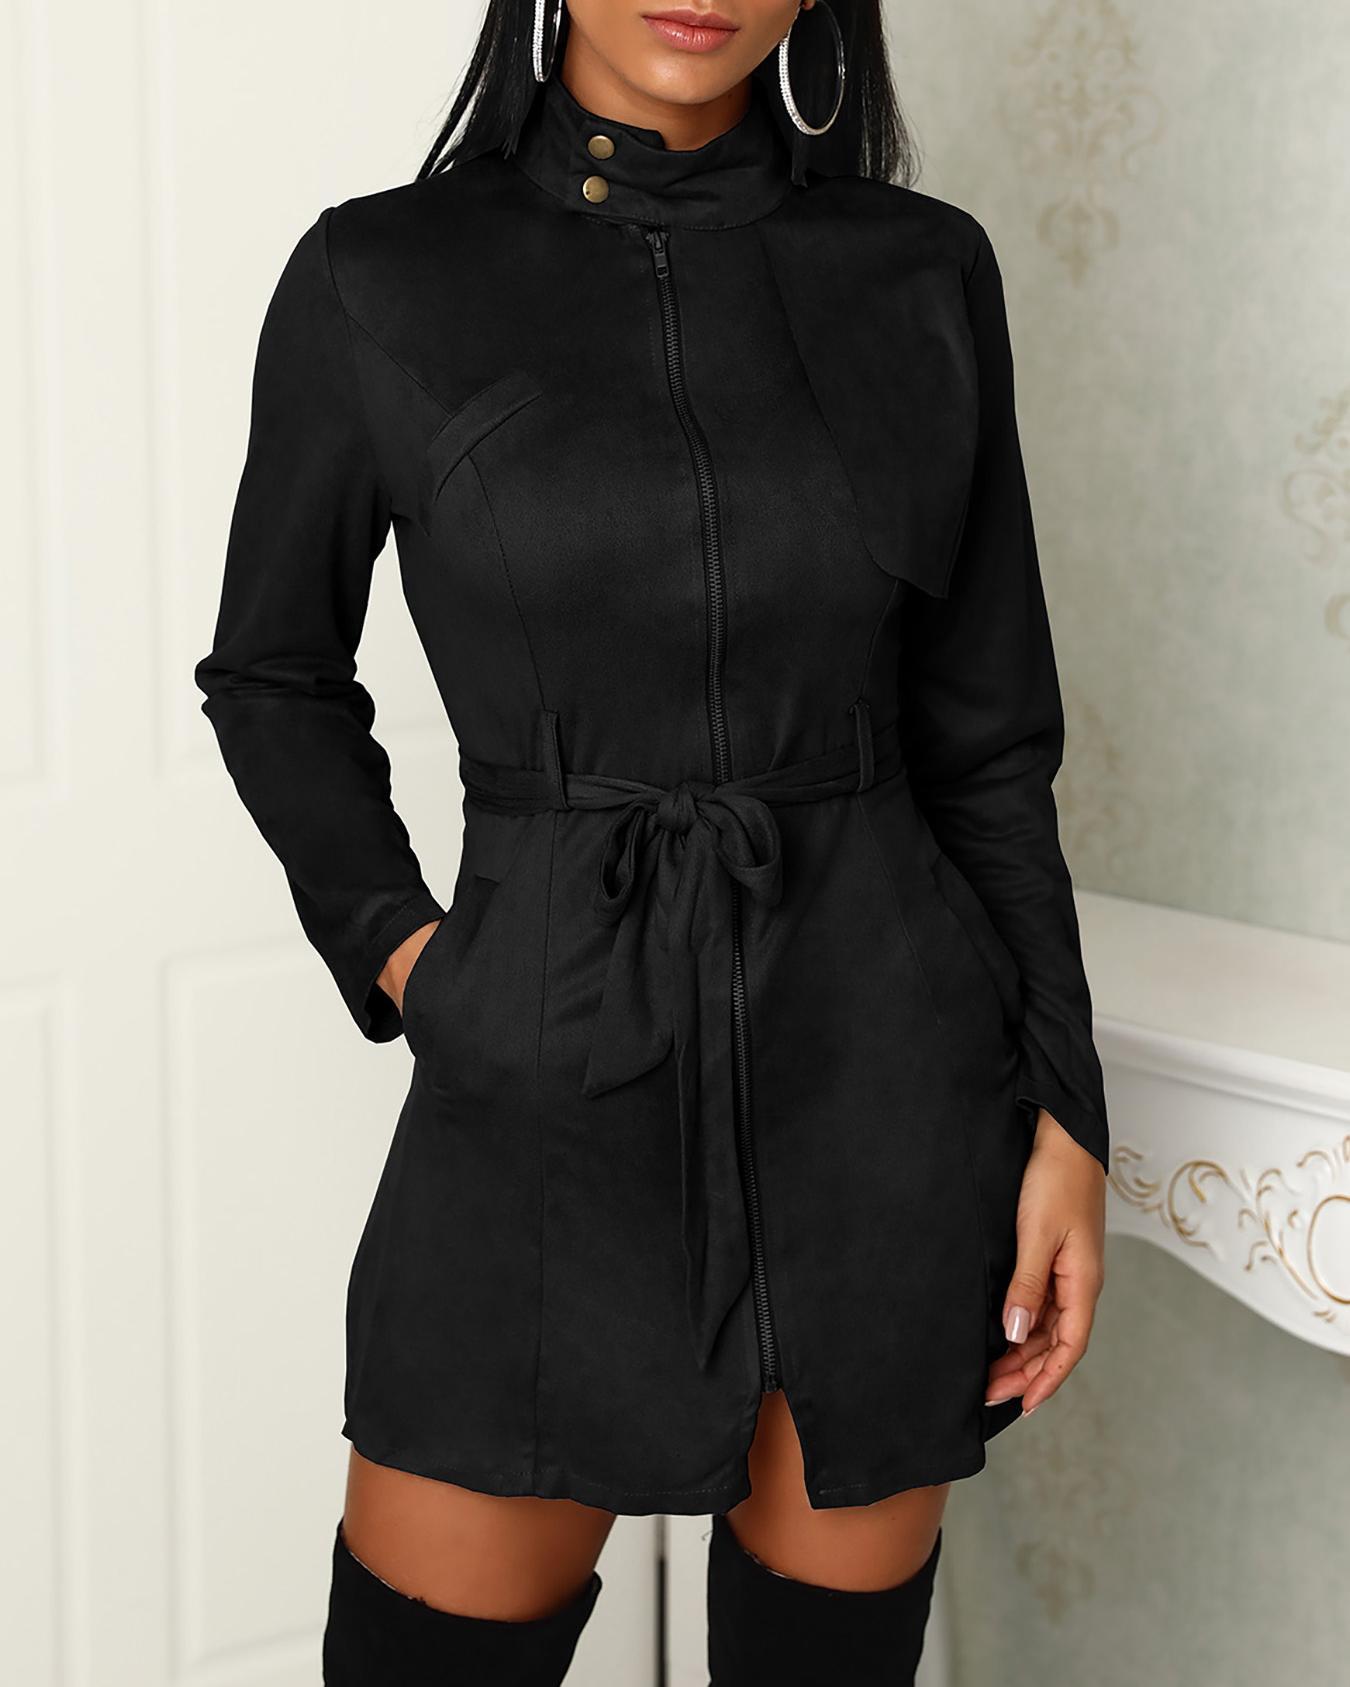 Boutiquefeel coupon: Trendy Zipper Front Pocket Design Belted Coats